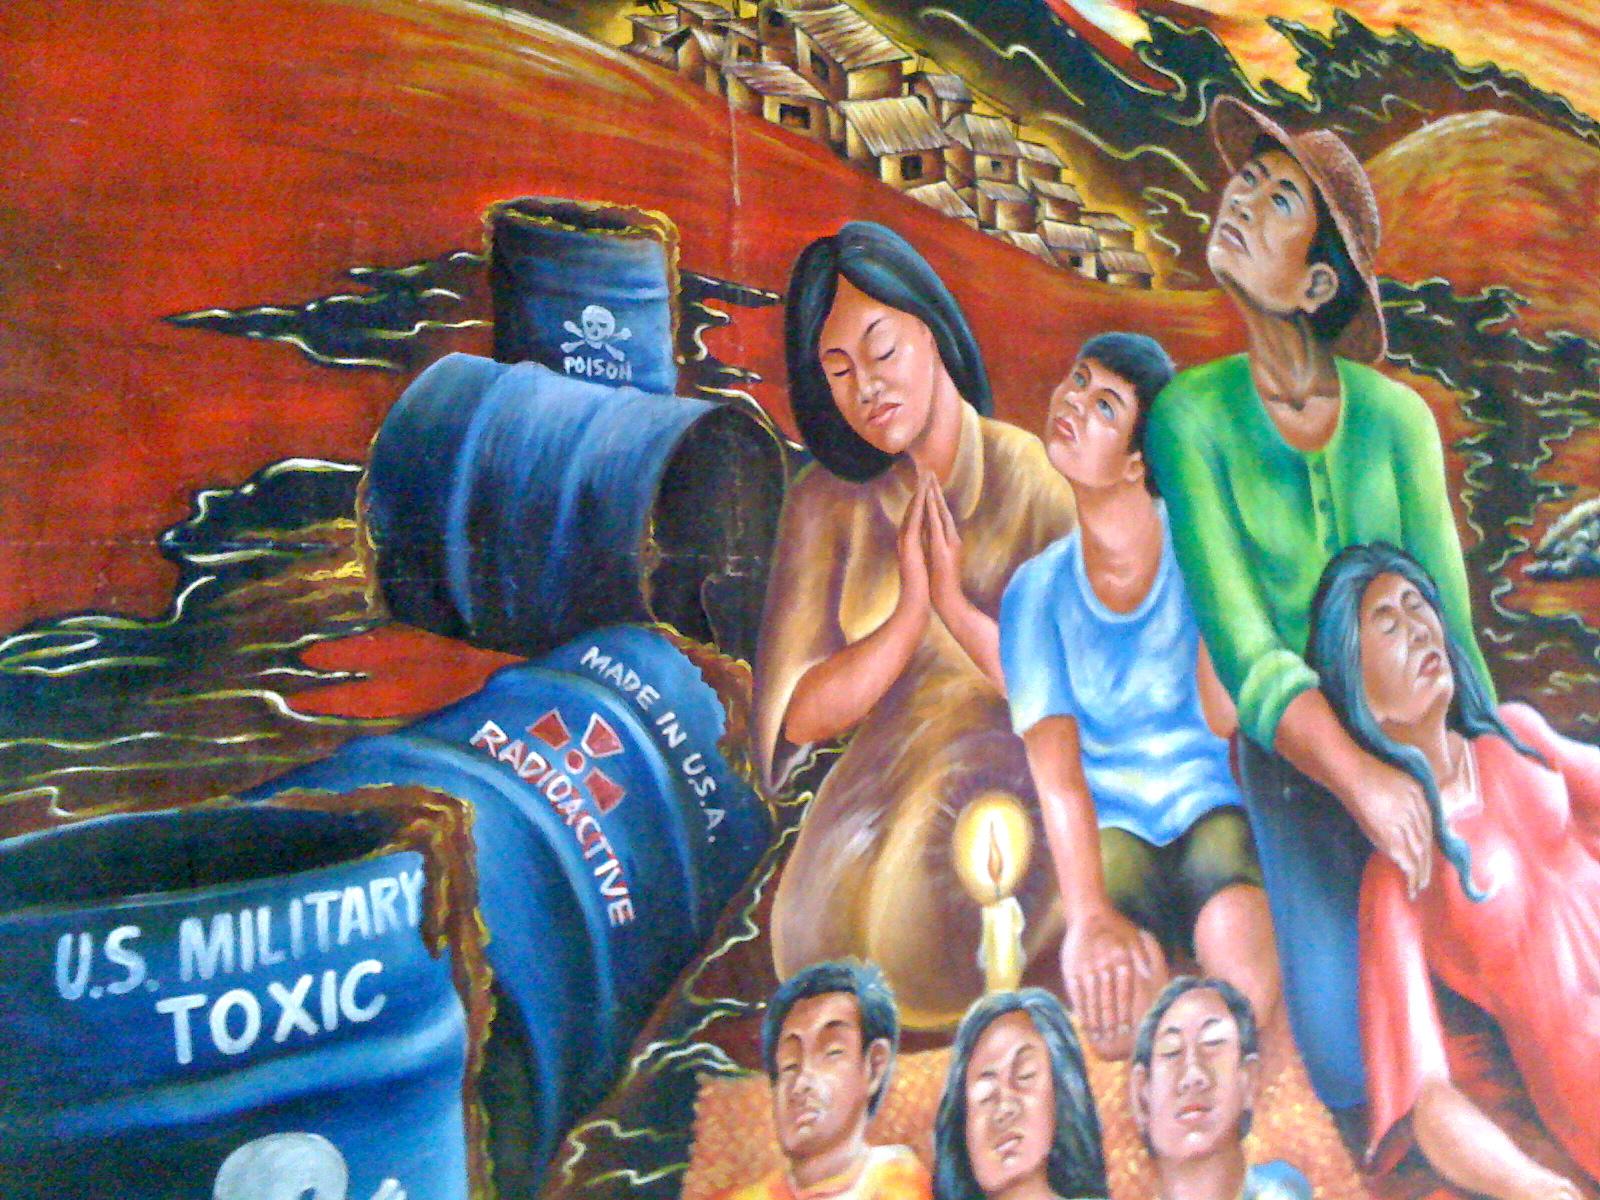 Subic Bay Art